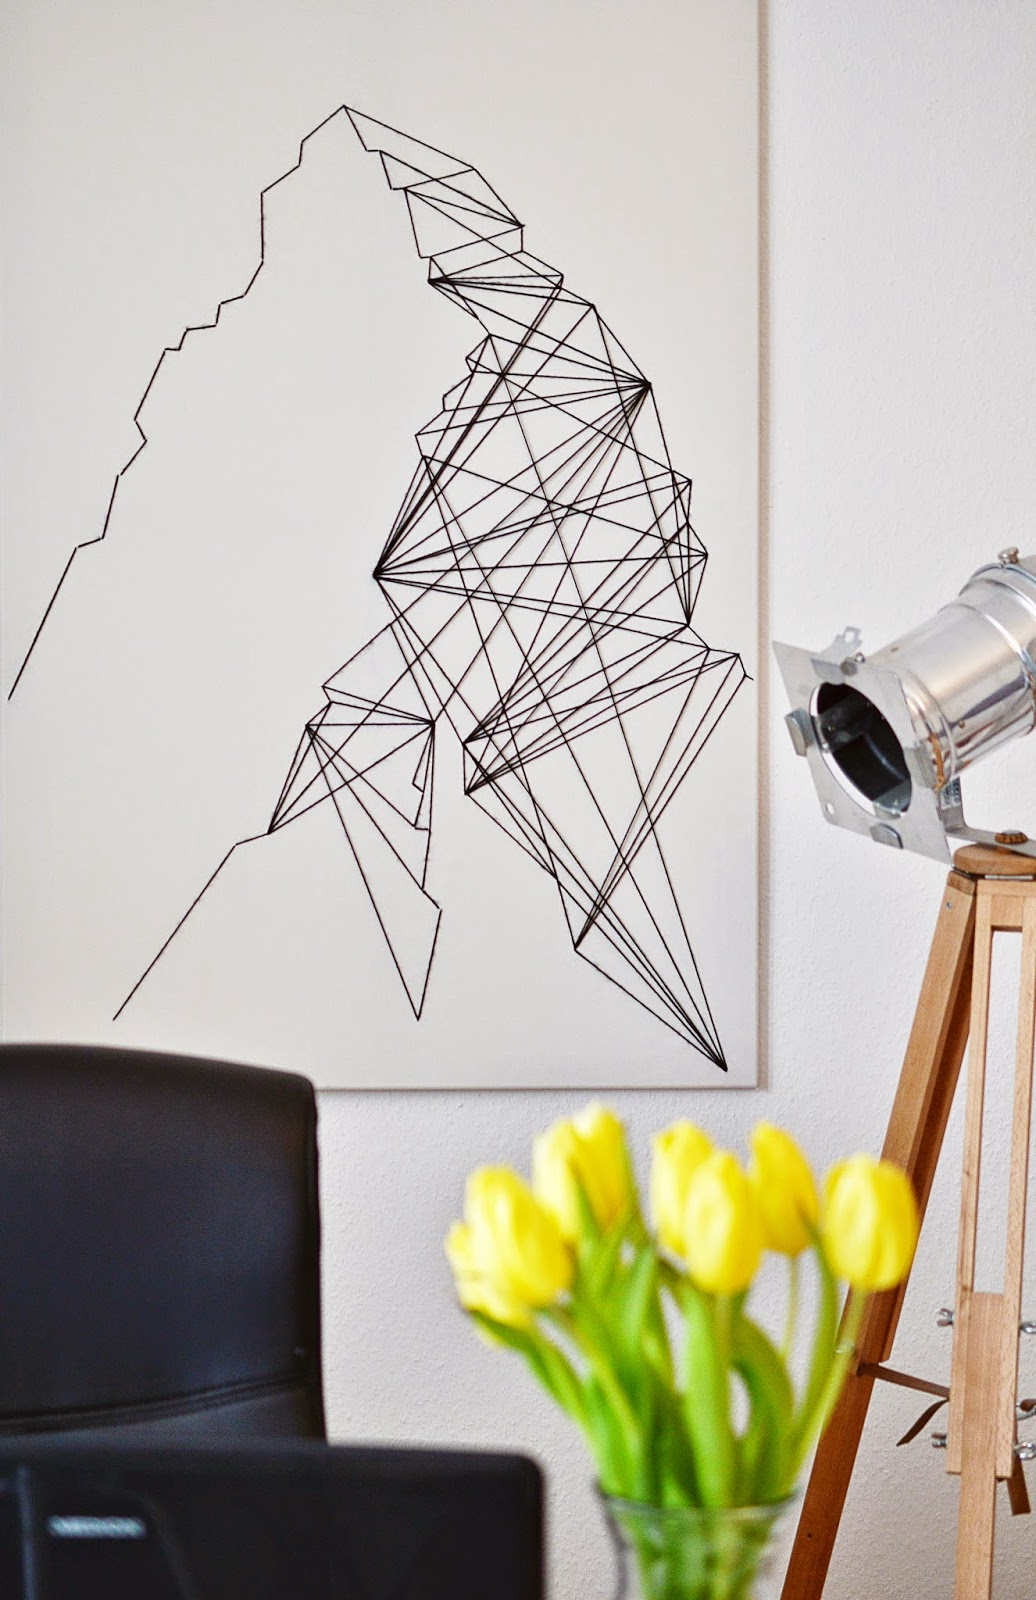 DIY Geometric String Art | Motteu0027s Blog & Math u0026 Other Headaches | DIY GEOMETRIC WALL ART - Motte